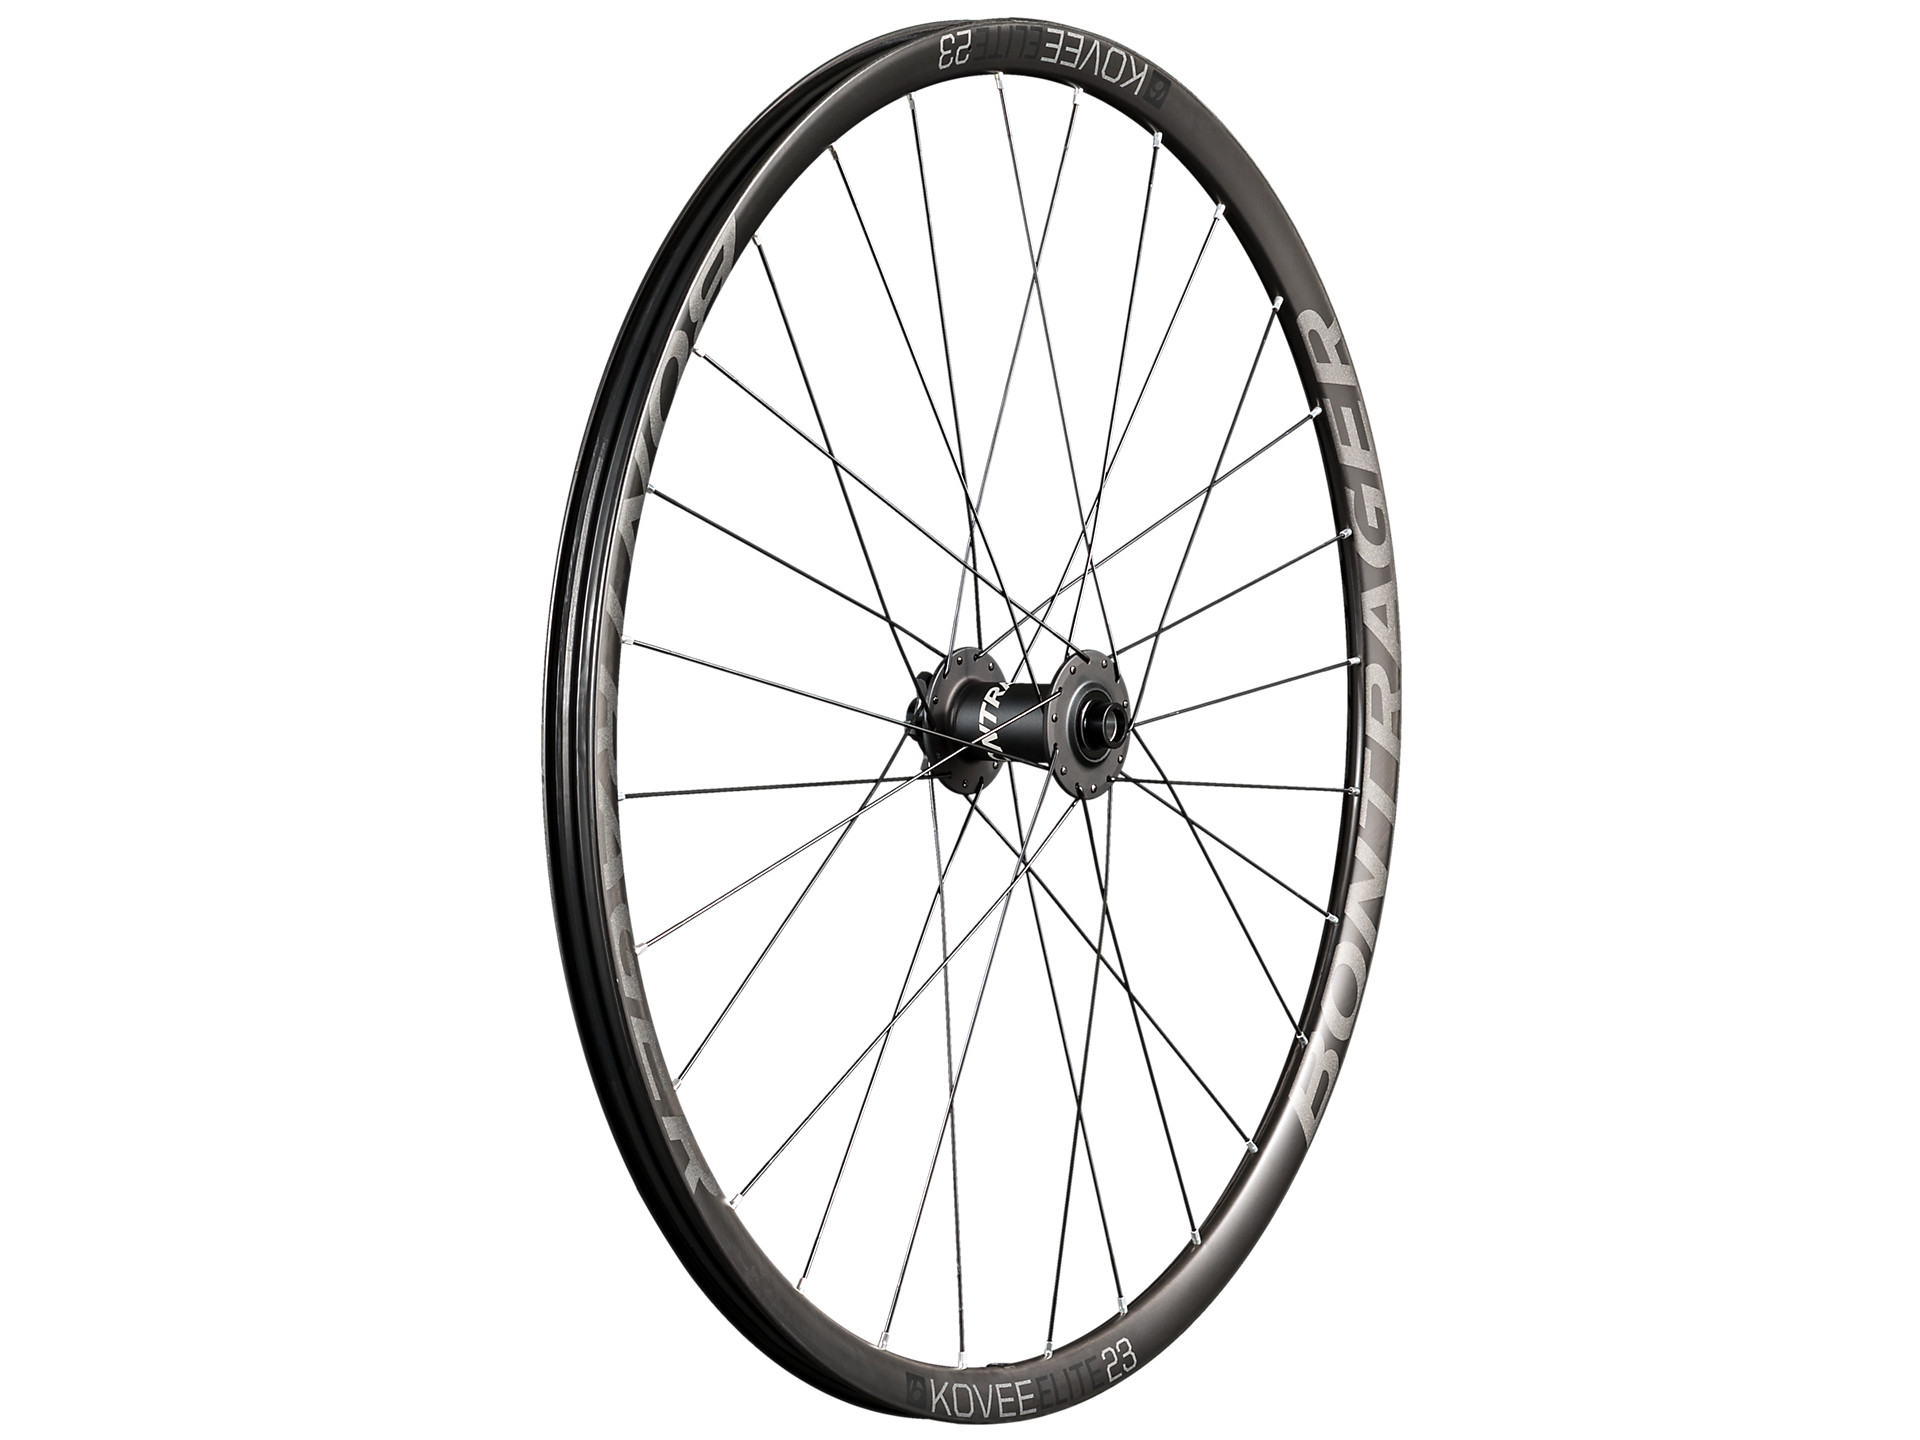 Bontrager Kovee Elite 23 Tlr Boost 29 Mtb Wheel Trek